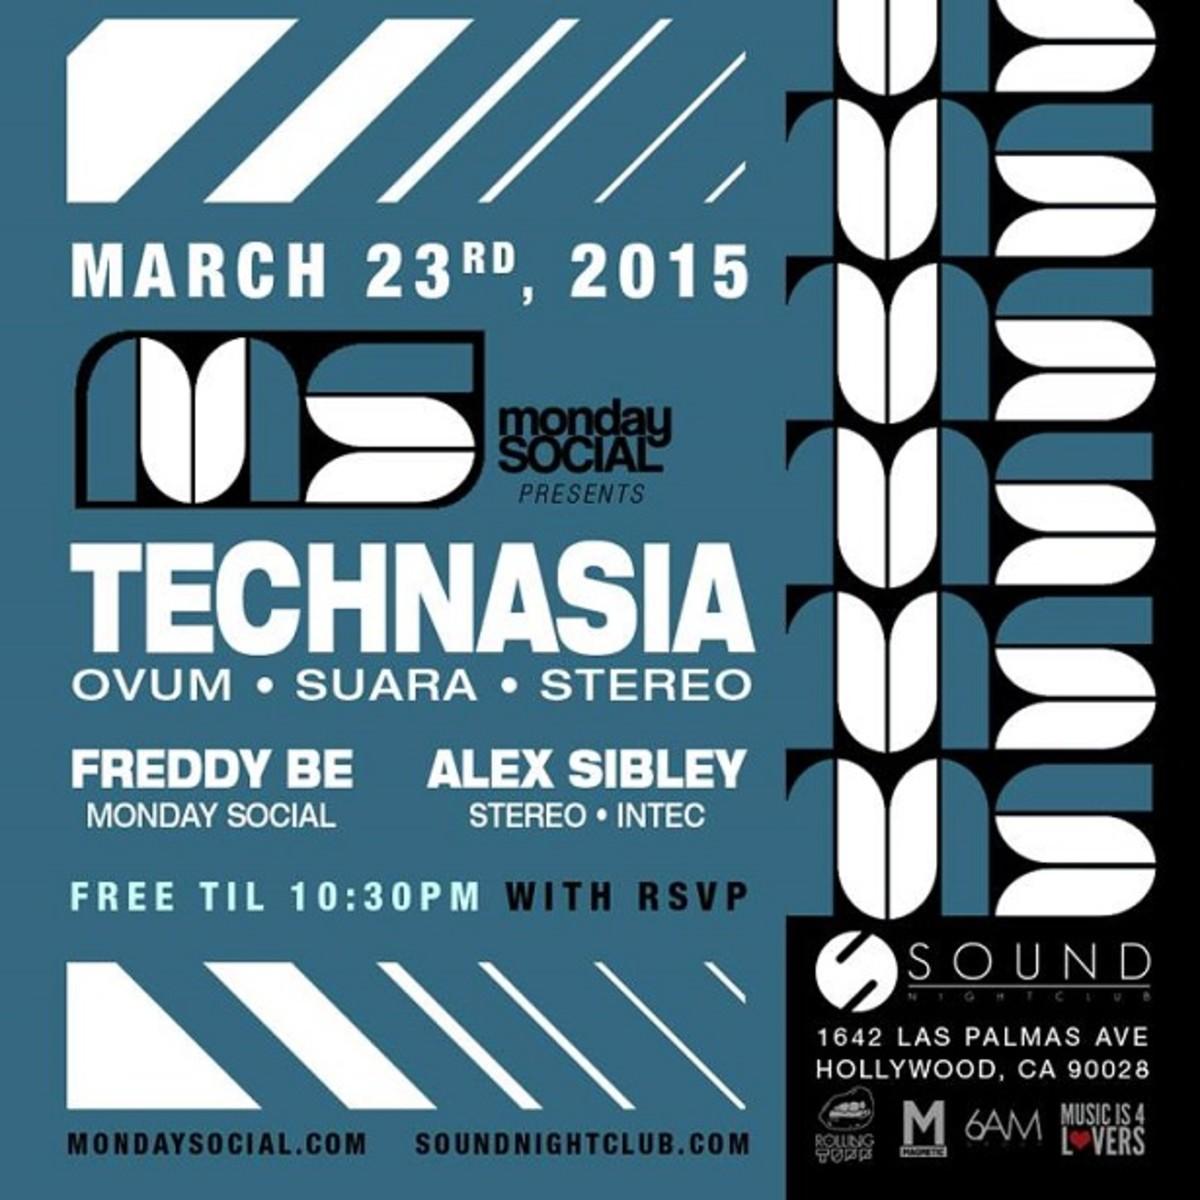 Monday Social Brings The Suara Heat on 3/23 & 3/30 with Technasia & Dosem!